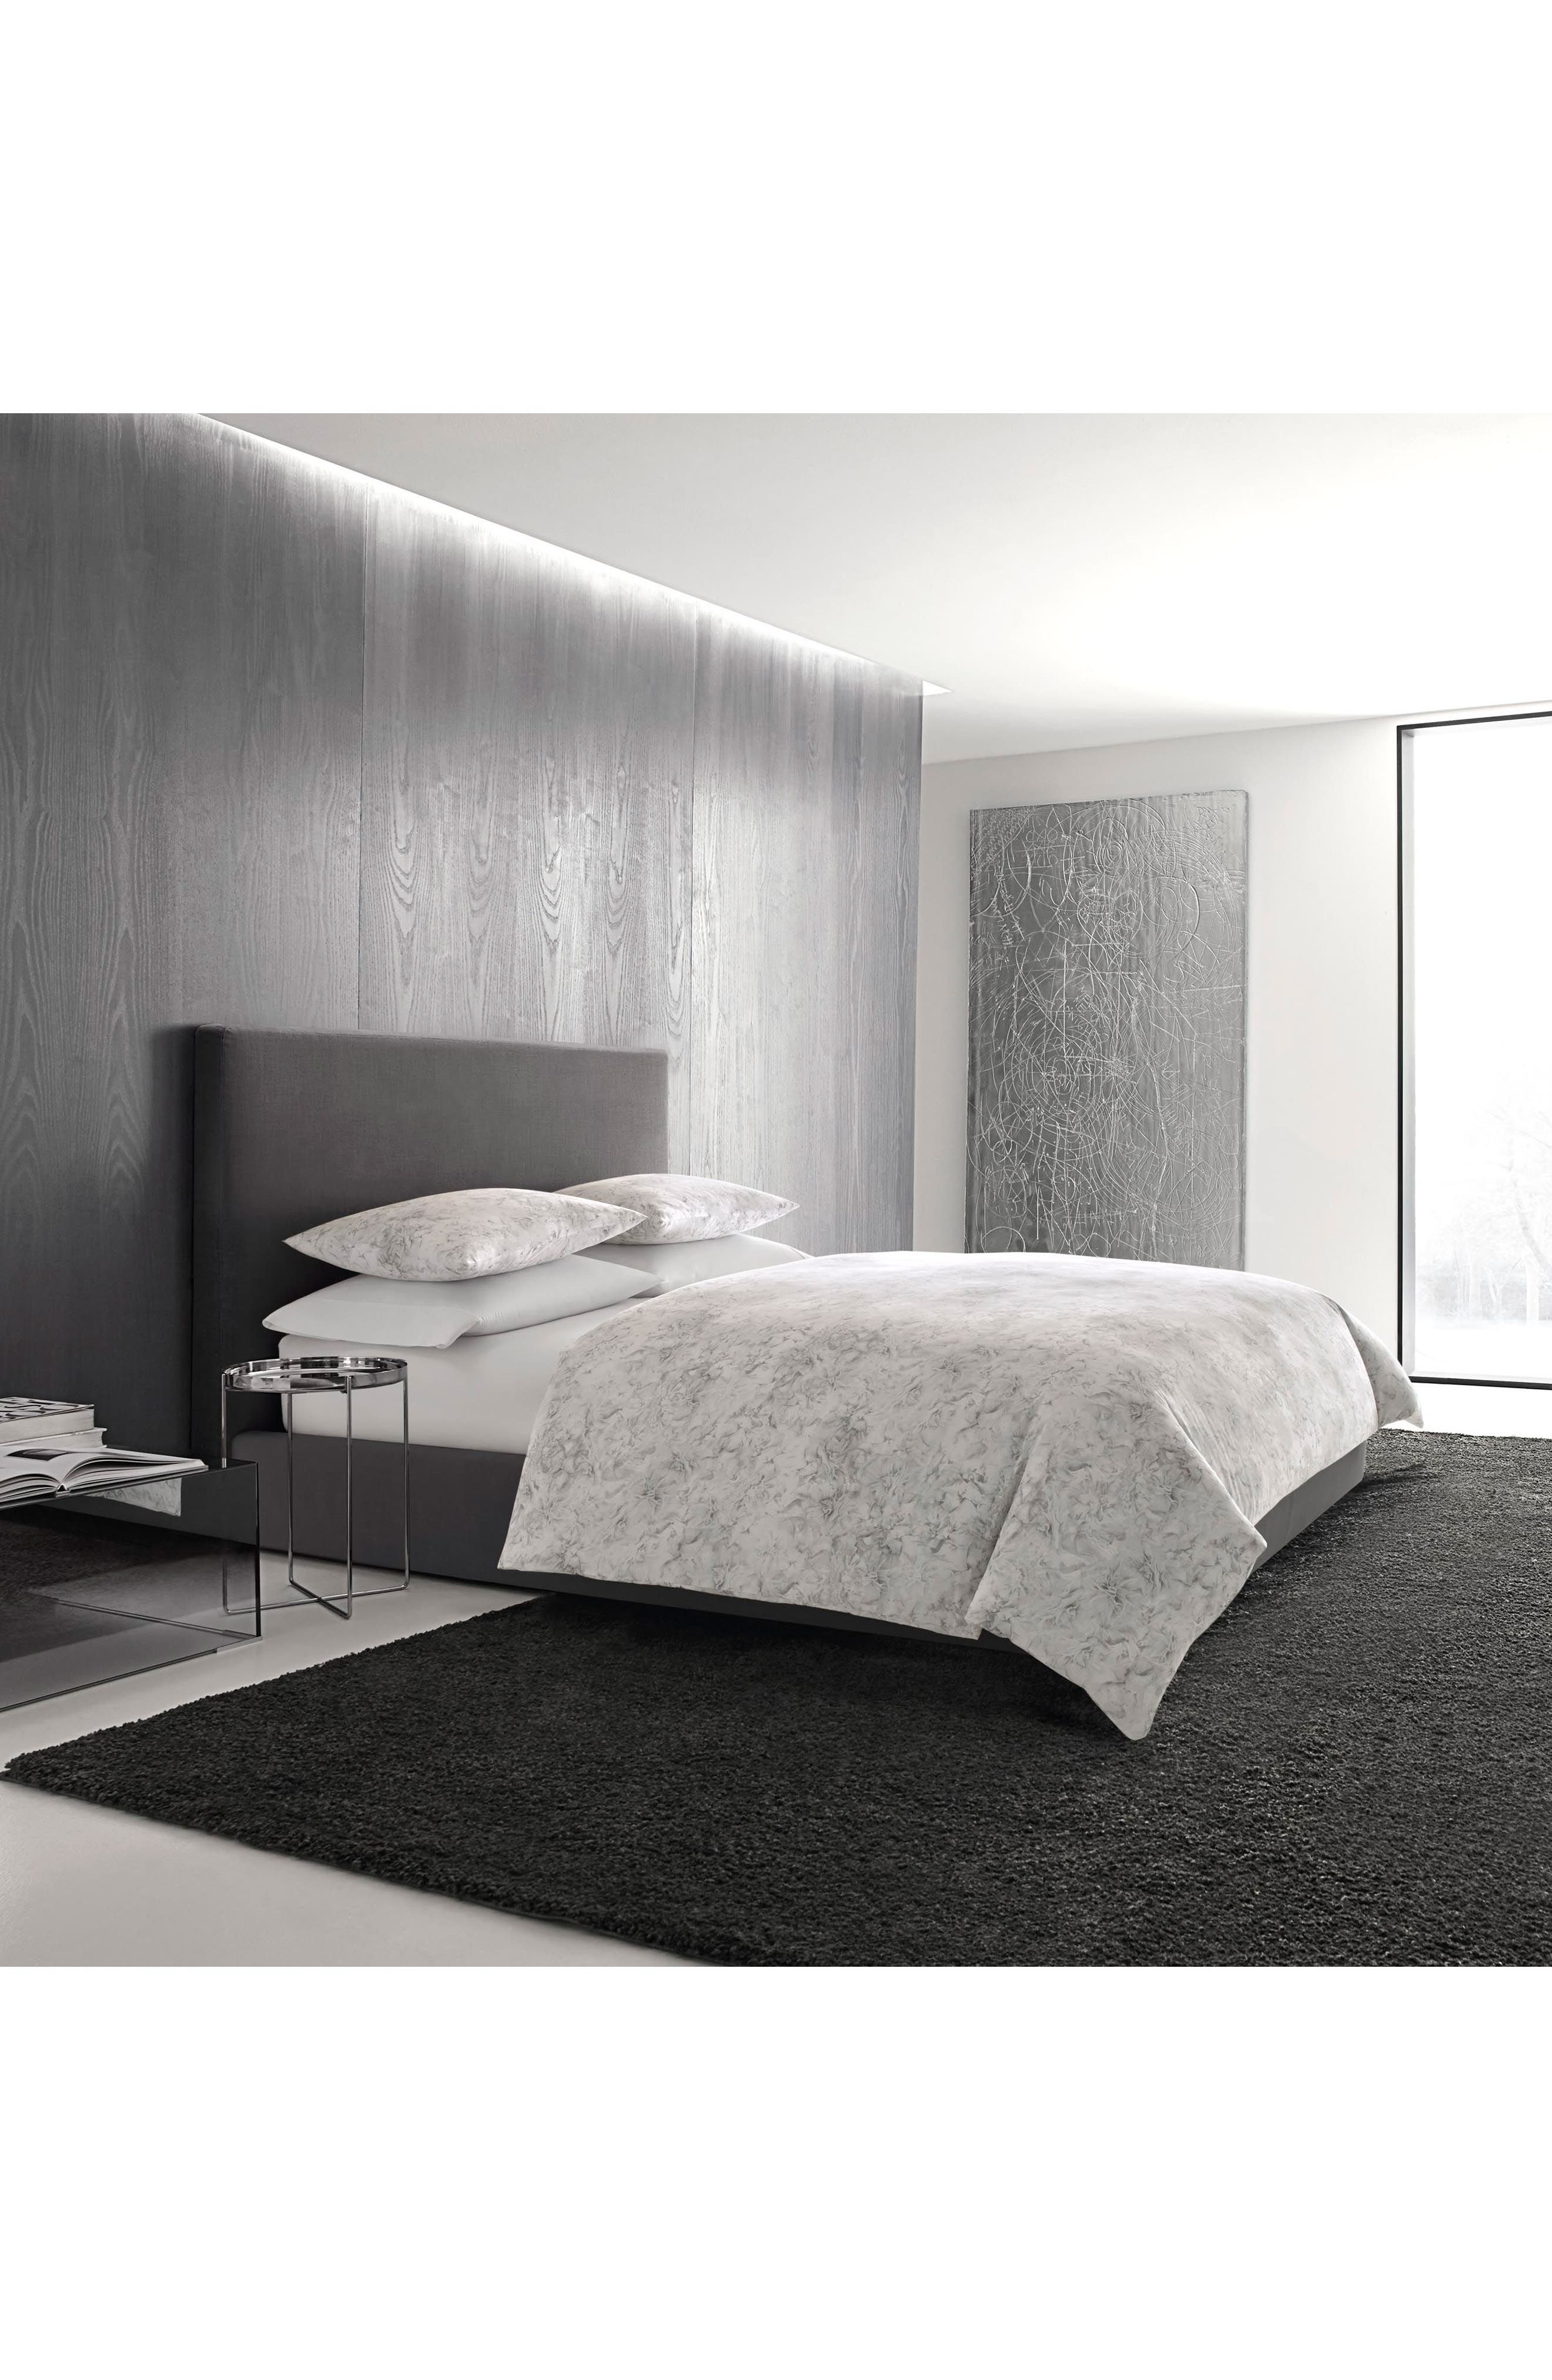 Vera Wang Tuille Floral Comforter & Sham Set